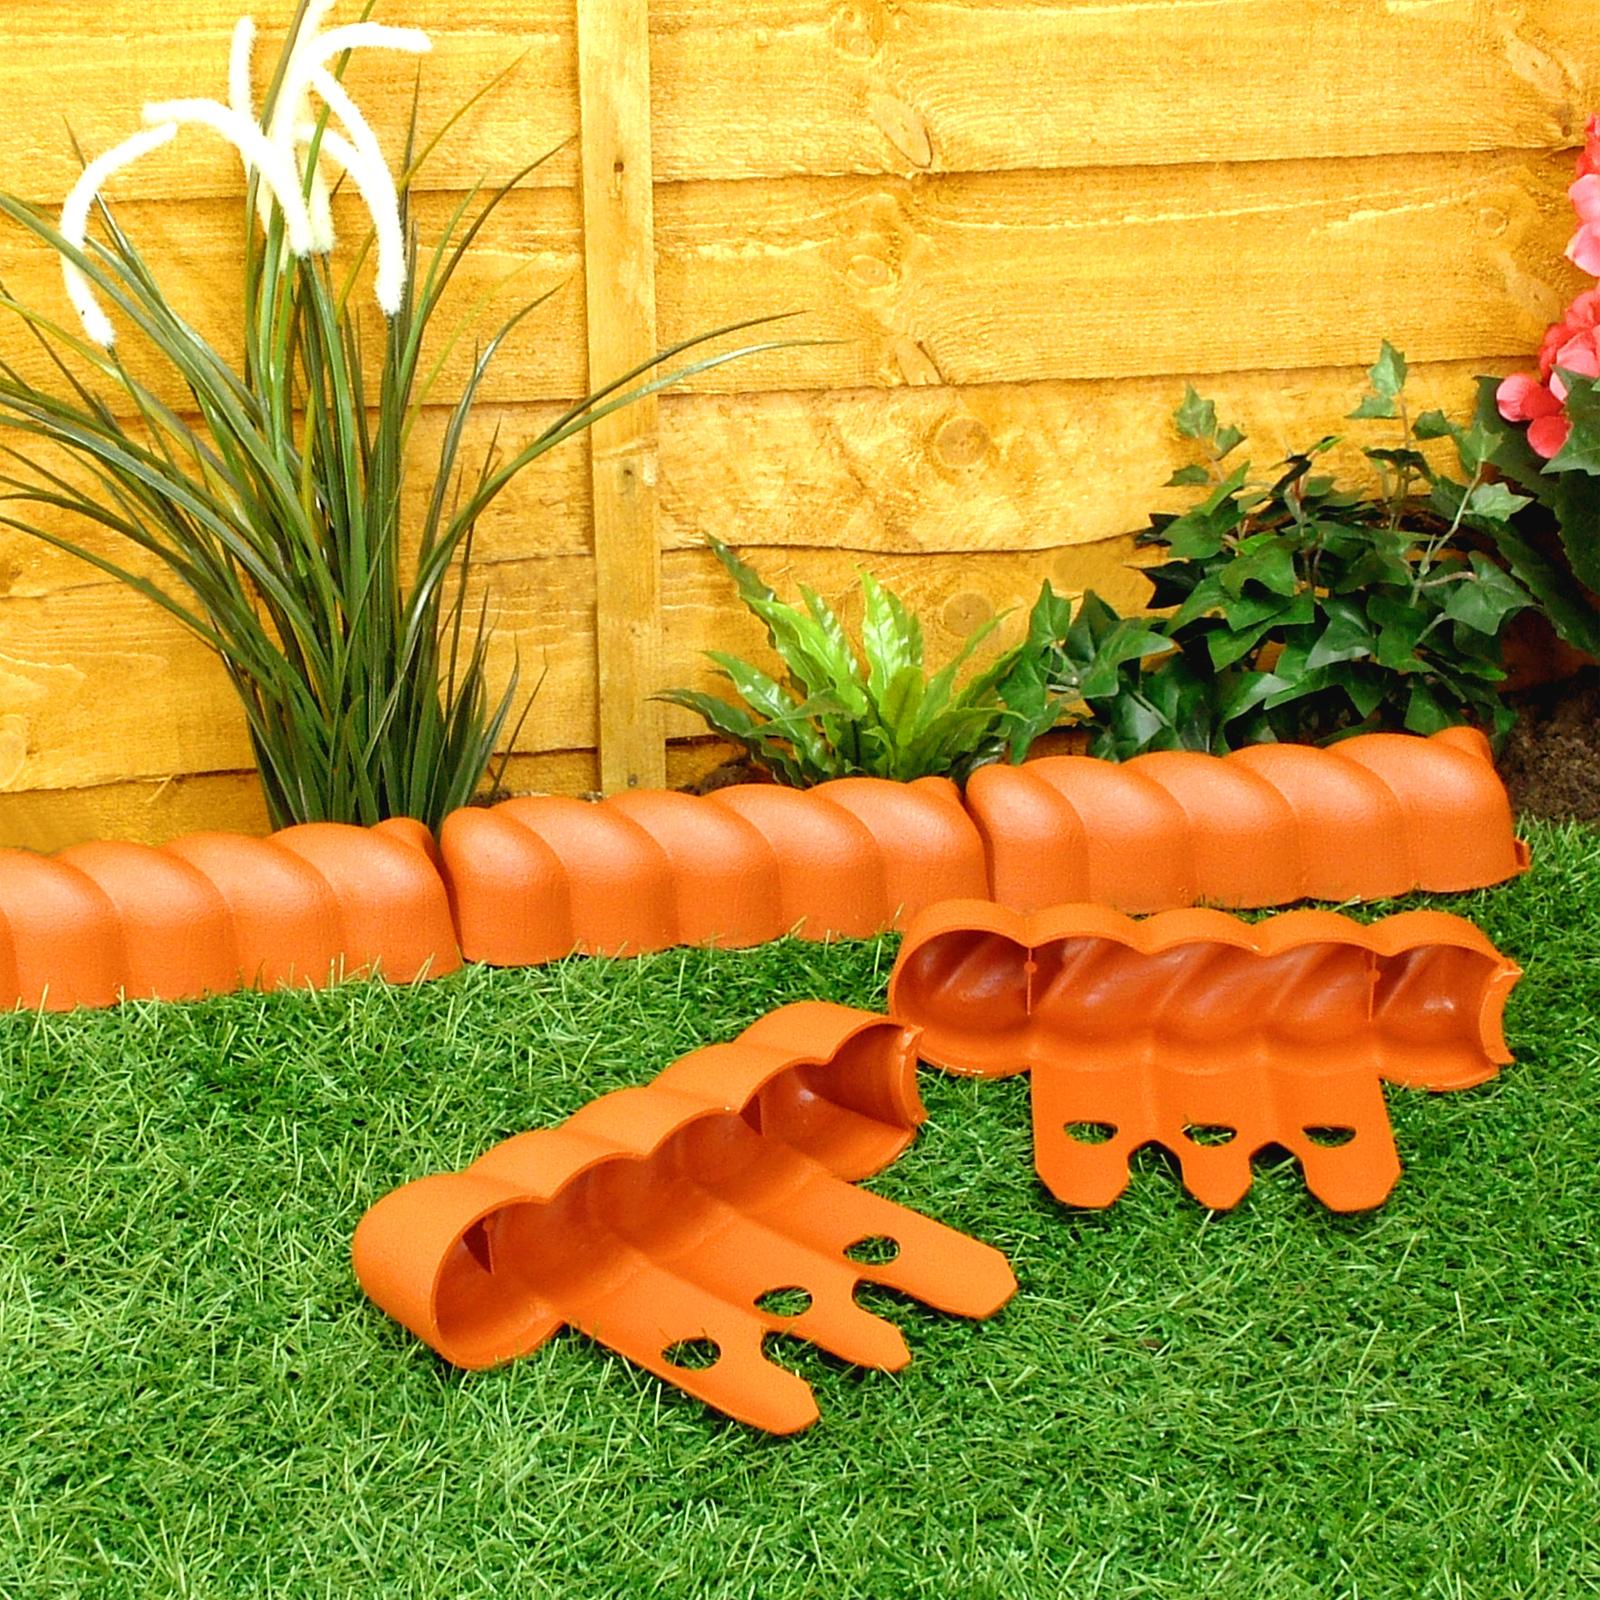 Garden border edging lawn grass terracotta victorian rope - Plastic border for garden ...